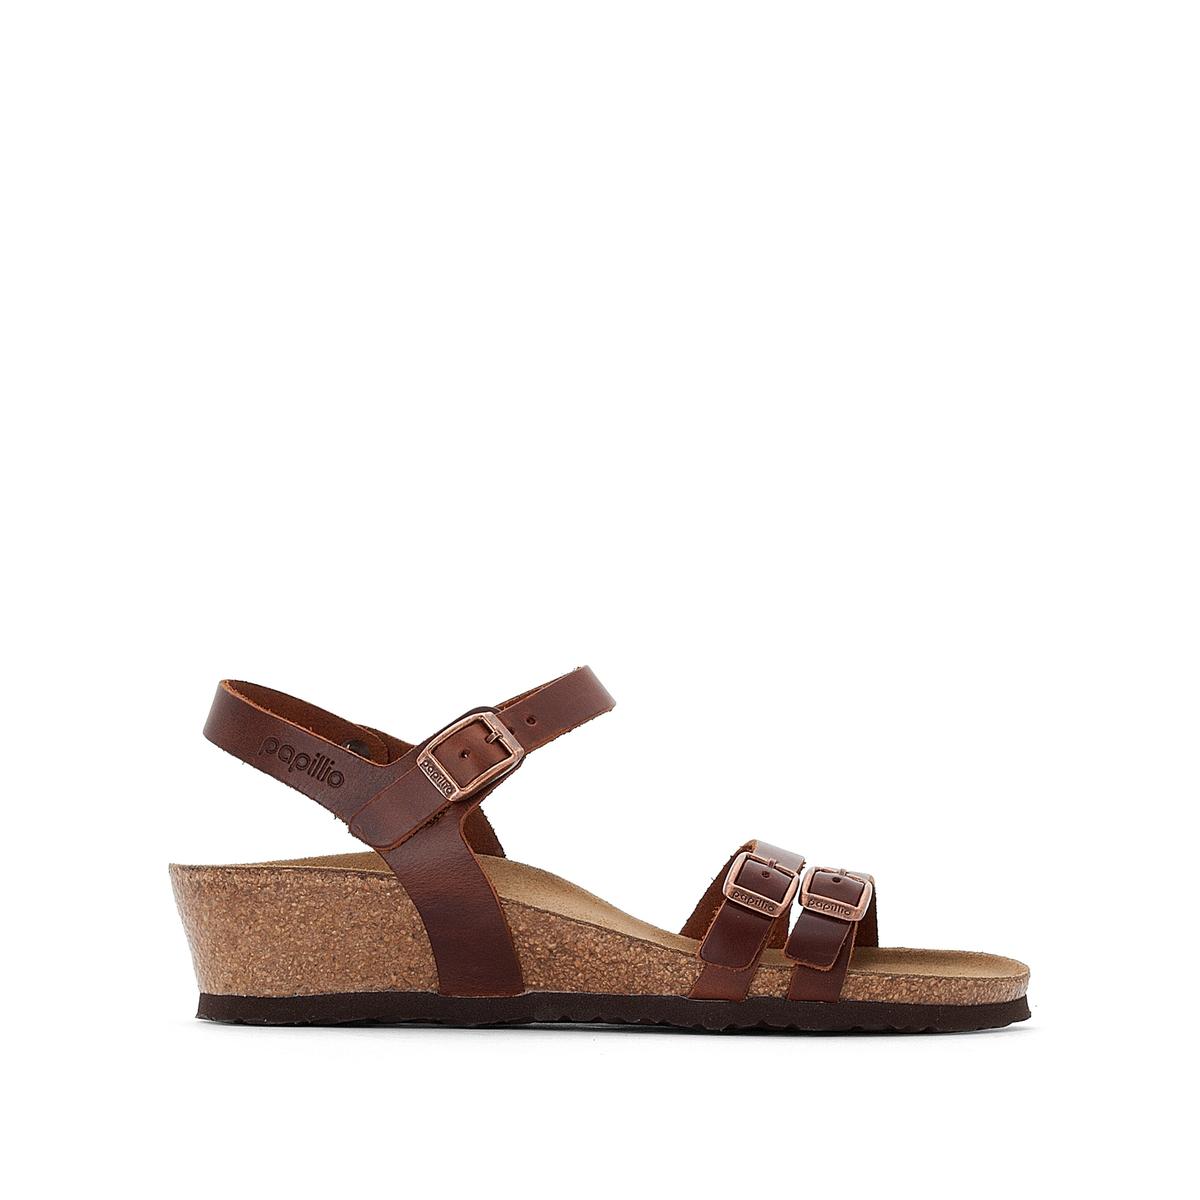 Босоножки кожаные на плоском каблуке Lana босоножки кожаные на плоском каблуке la conquise